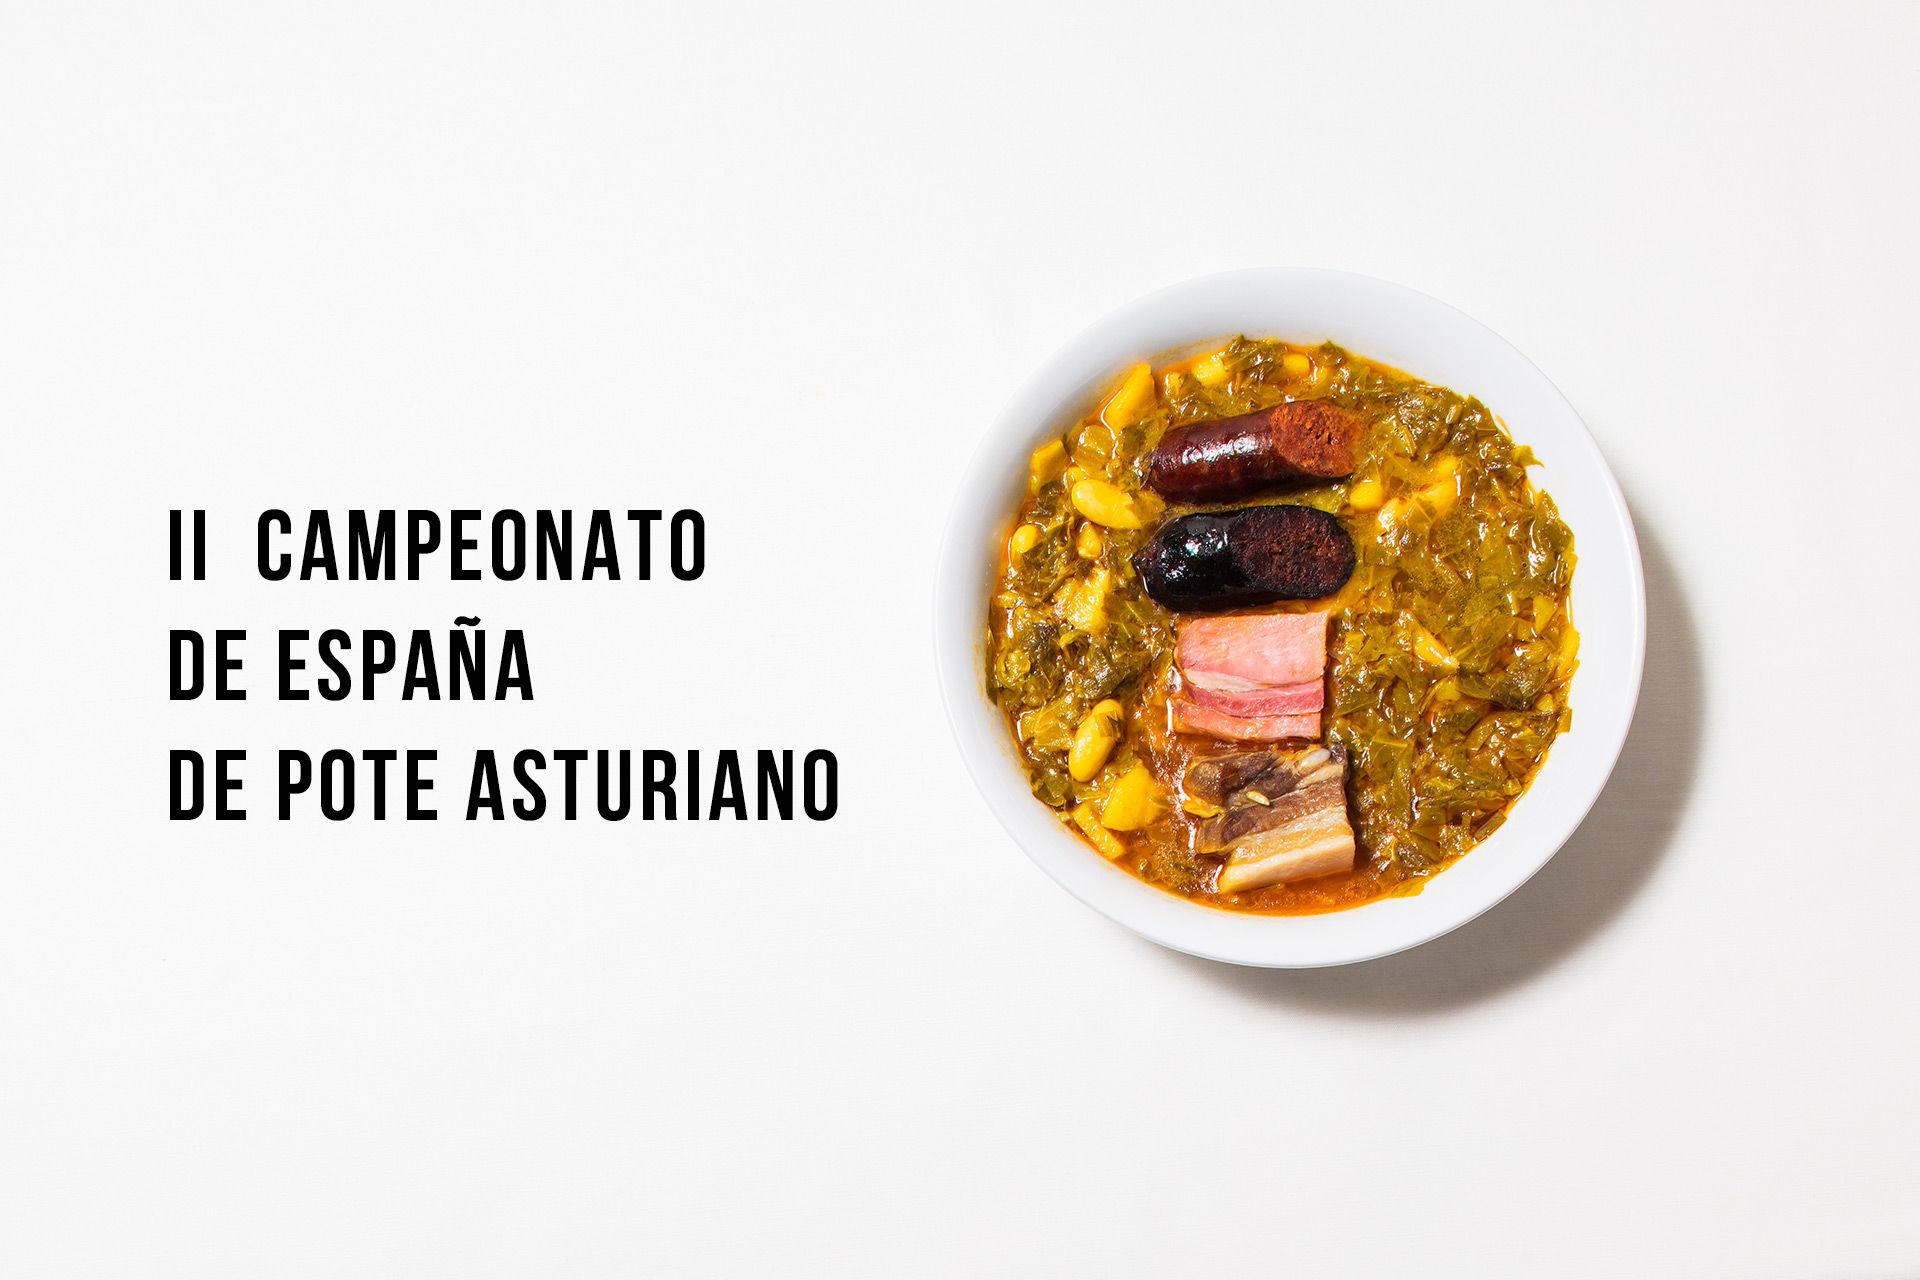 Pote Asturiano